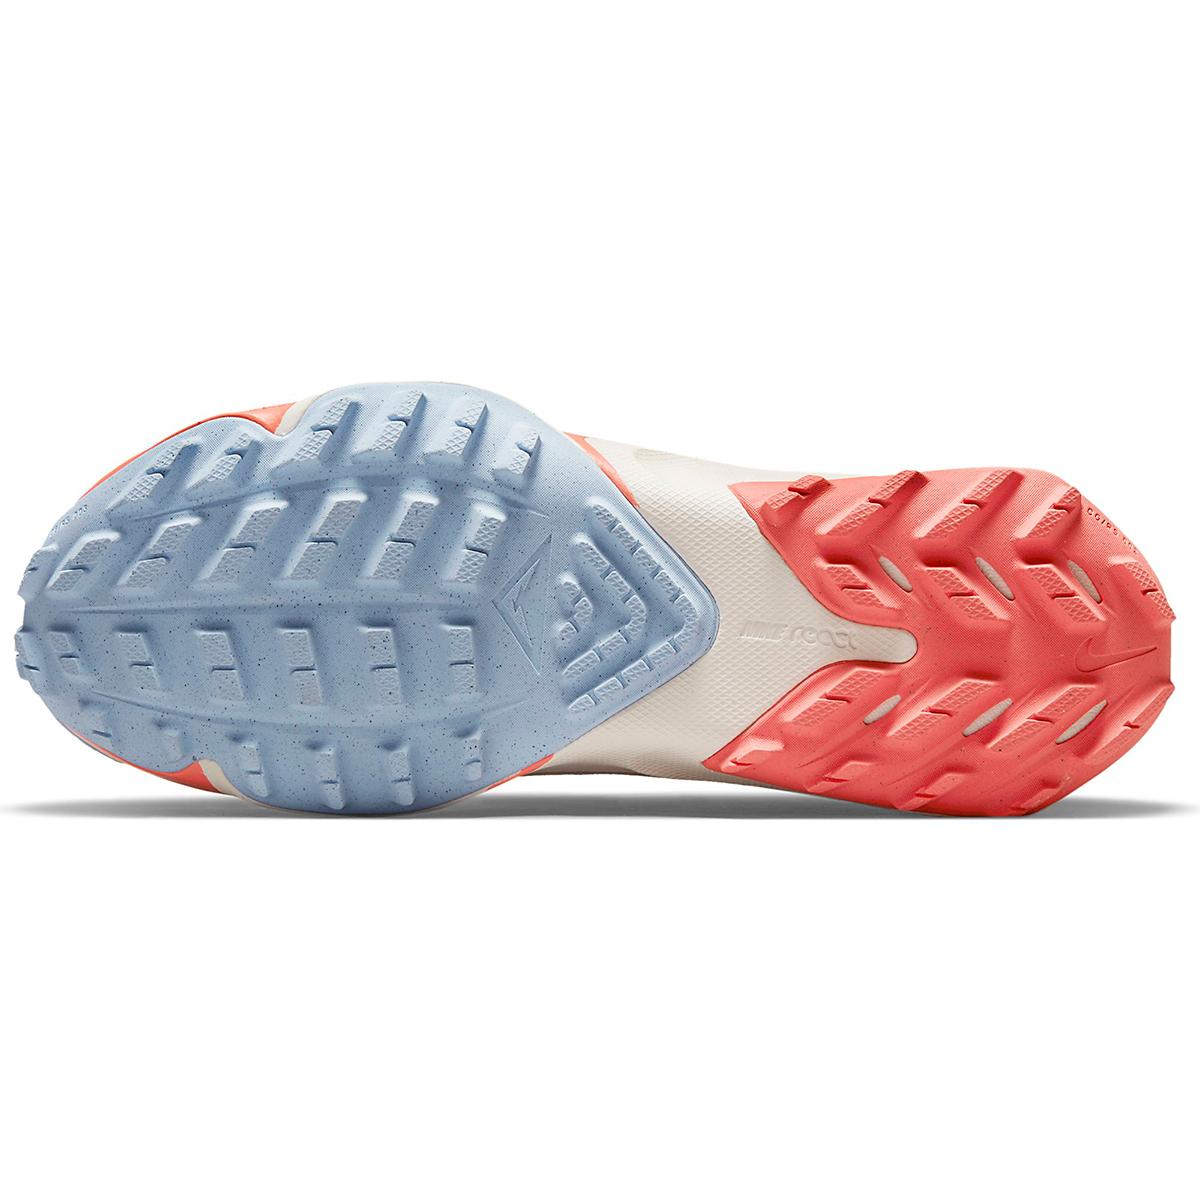 Women's Nike Air Zoom Terra Kiger 7 Trail Running Shoe - Color: Light Soft Pink/Bicoastal/Magic Ember - Size: 5 - Width: Regular, Light Soft Pink/Bicoastal/Magic Ember, large, image 4